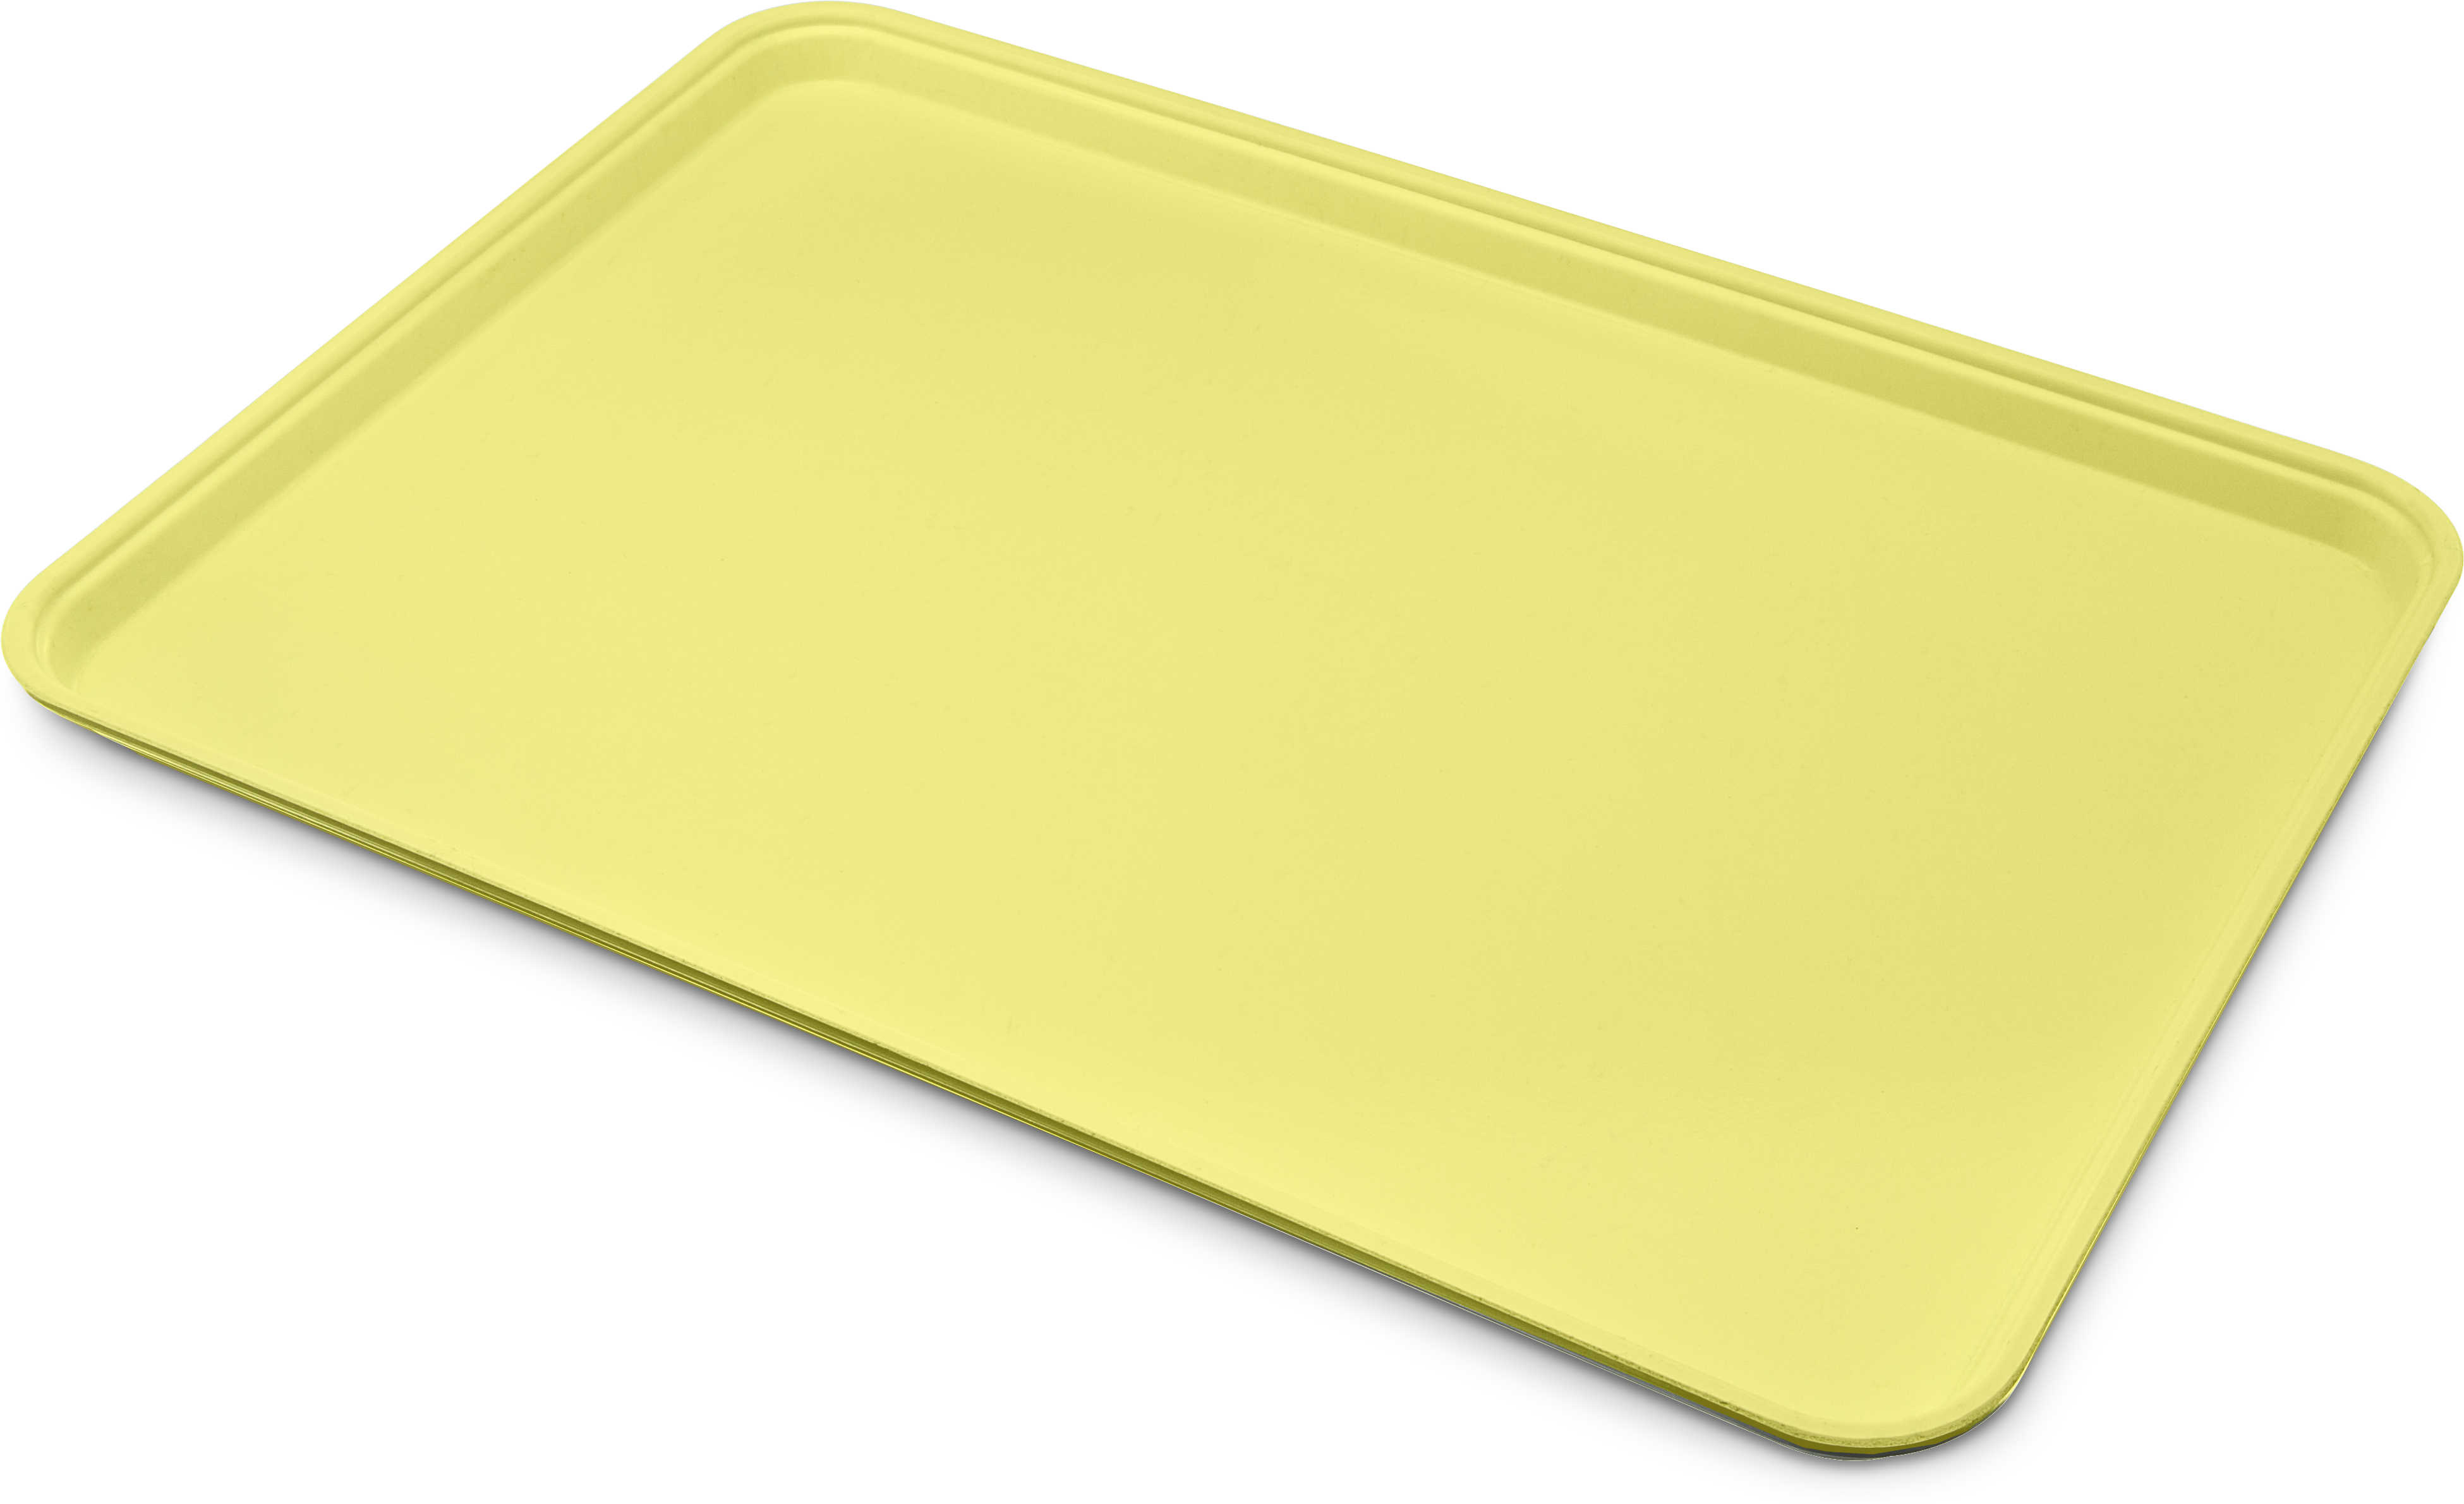 Glasteel Tray Display/Bakery 17.9 x 25.6 - Pineapple